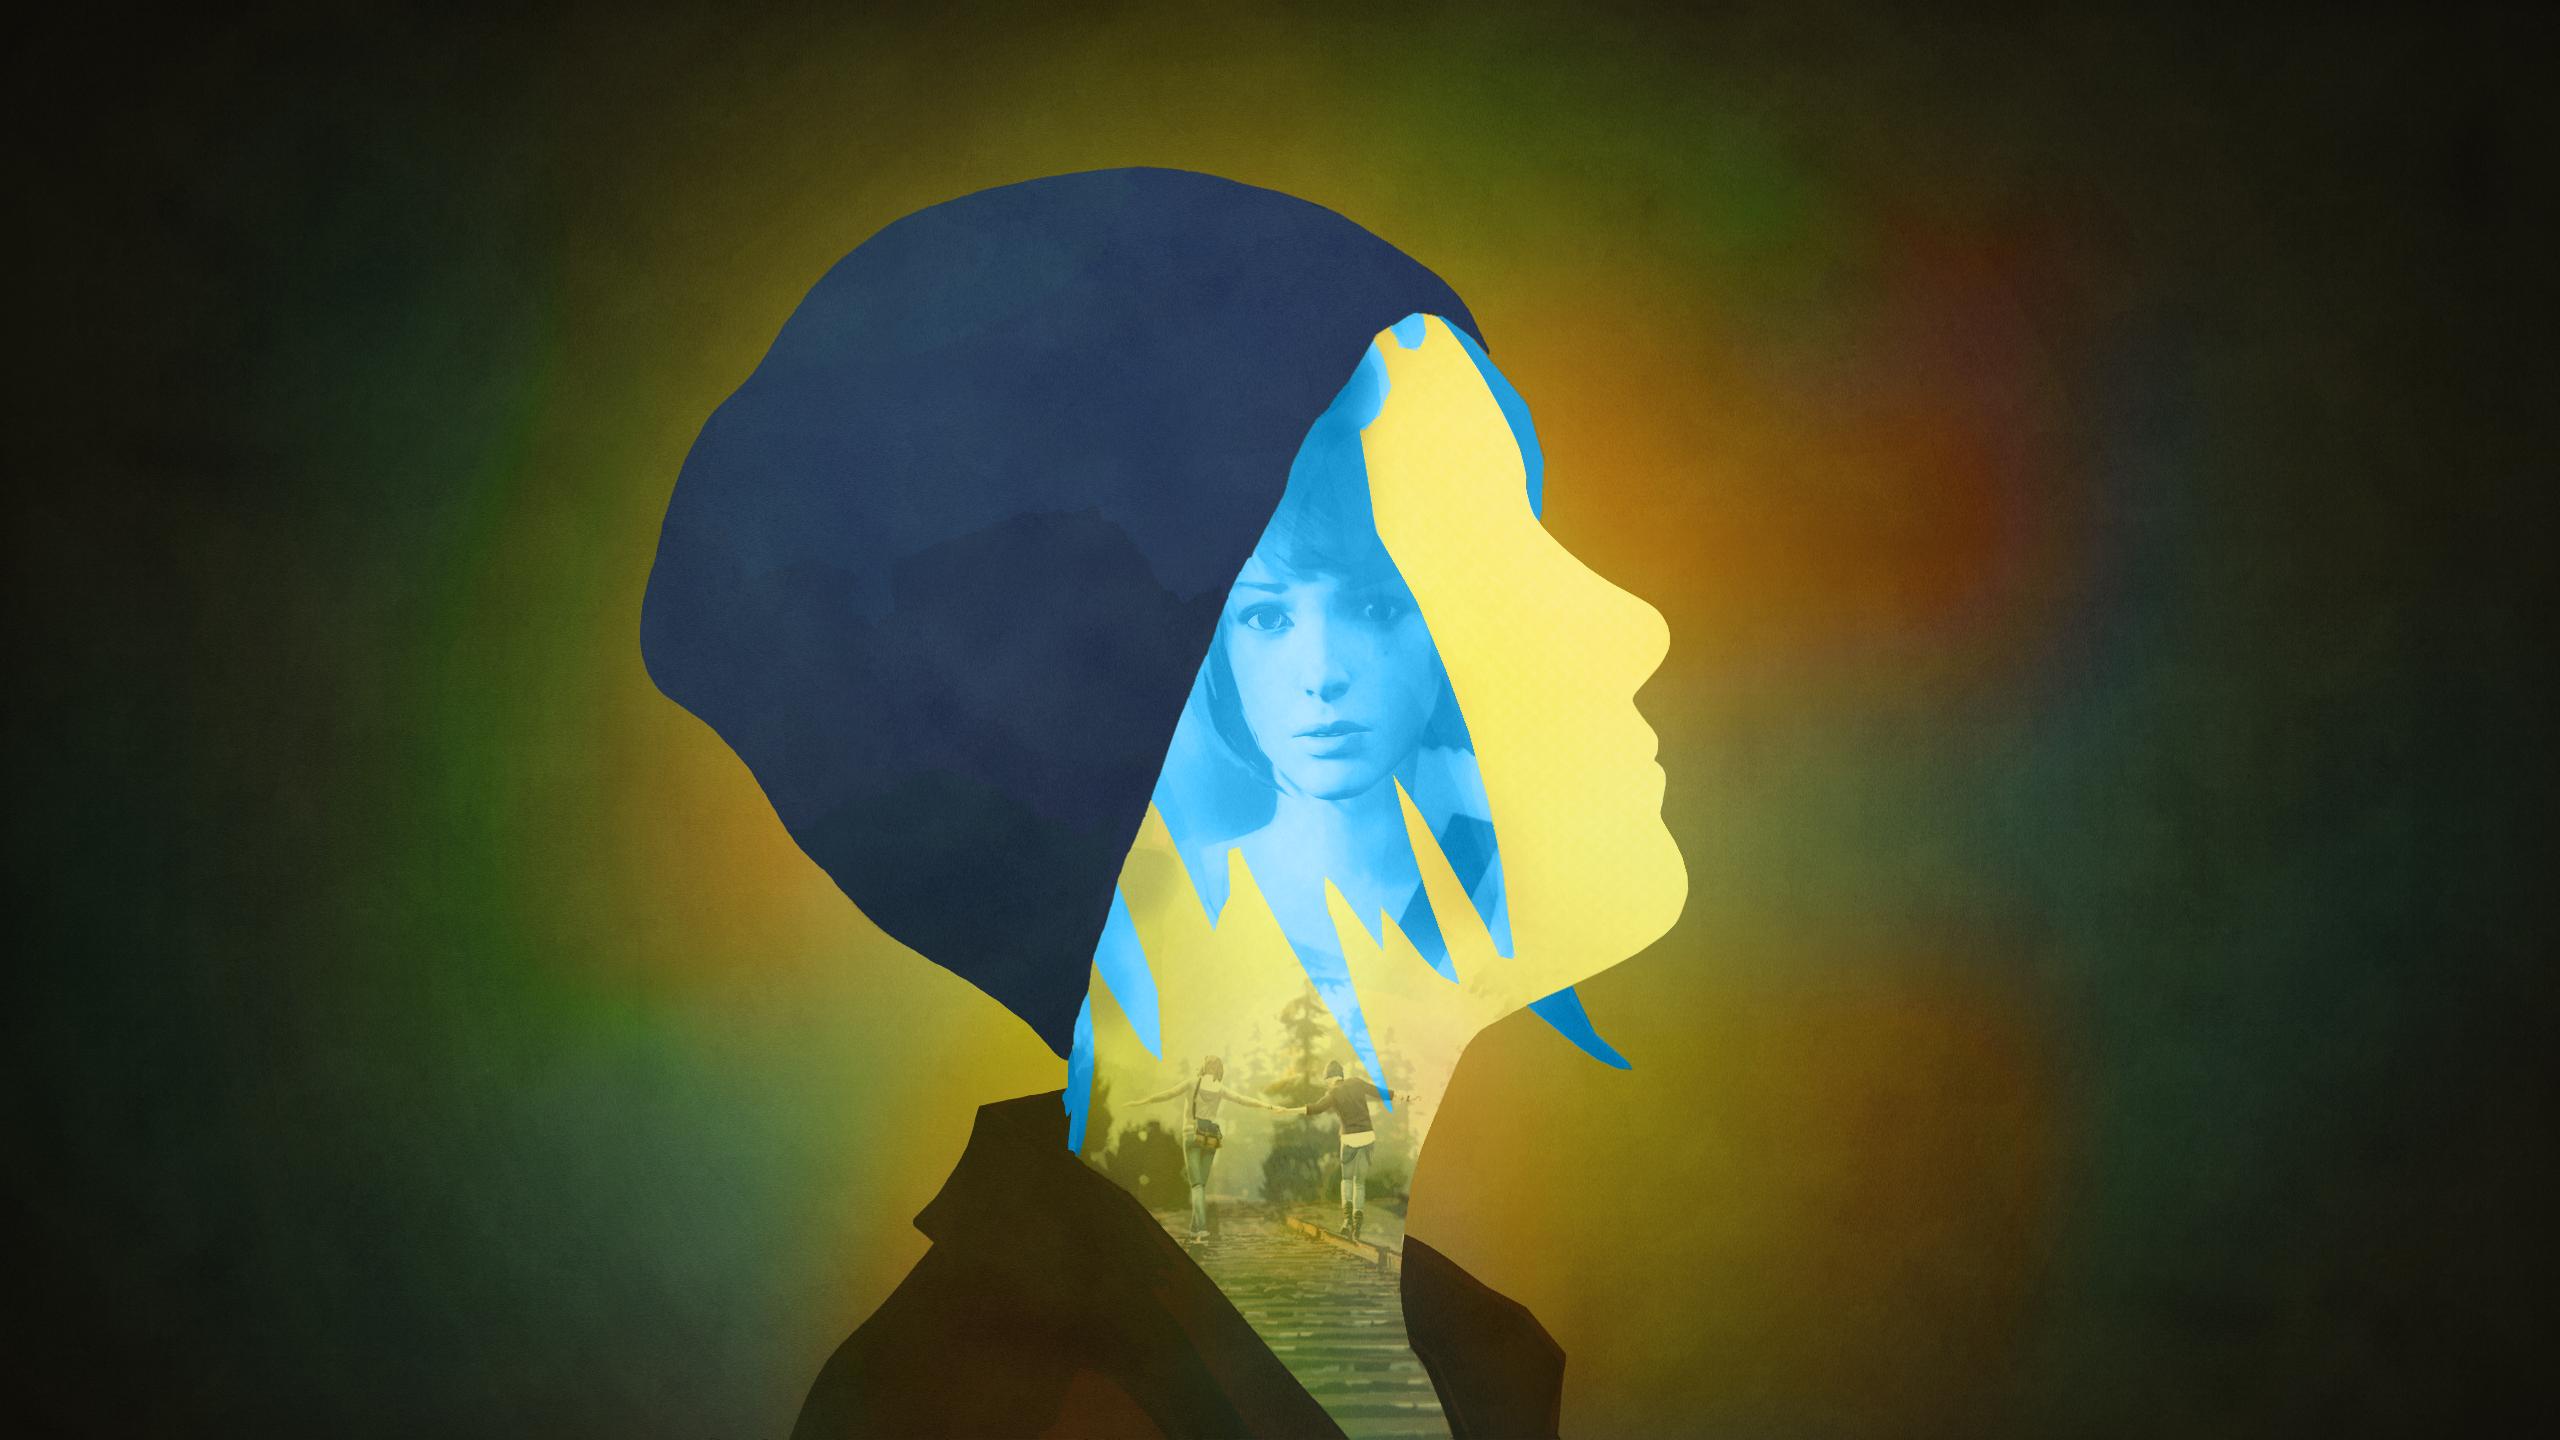 Life Is Strange - Chloe Silhouette (No logo) by RockLou